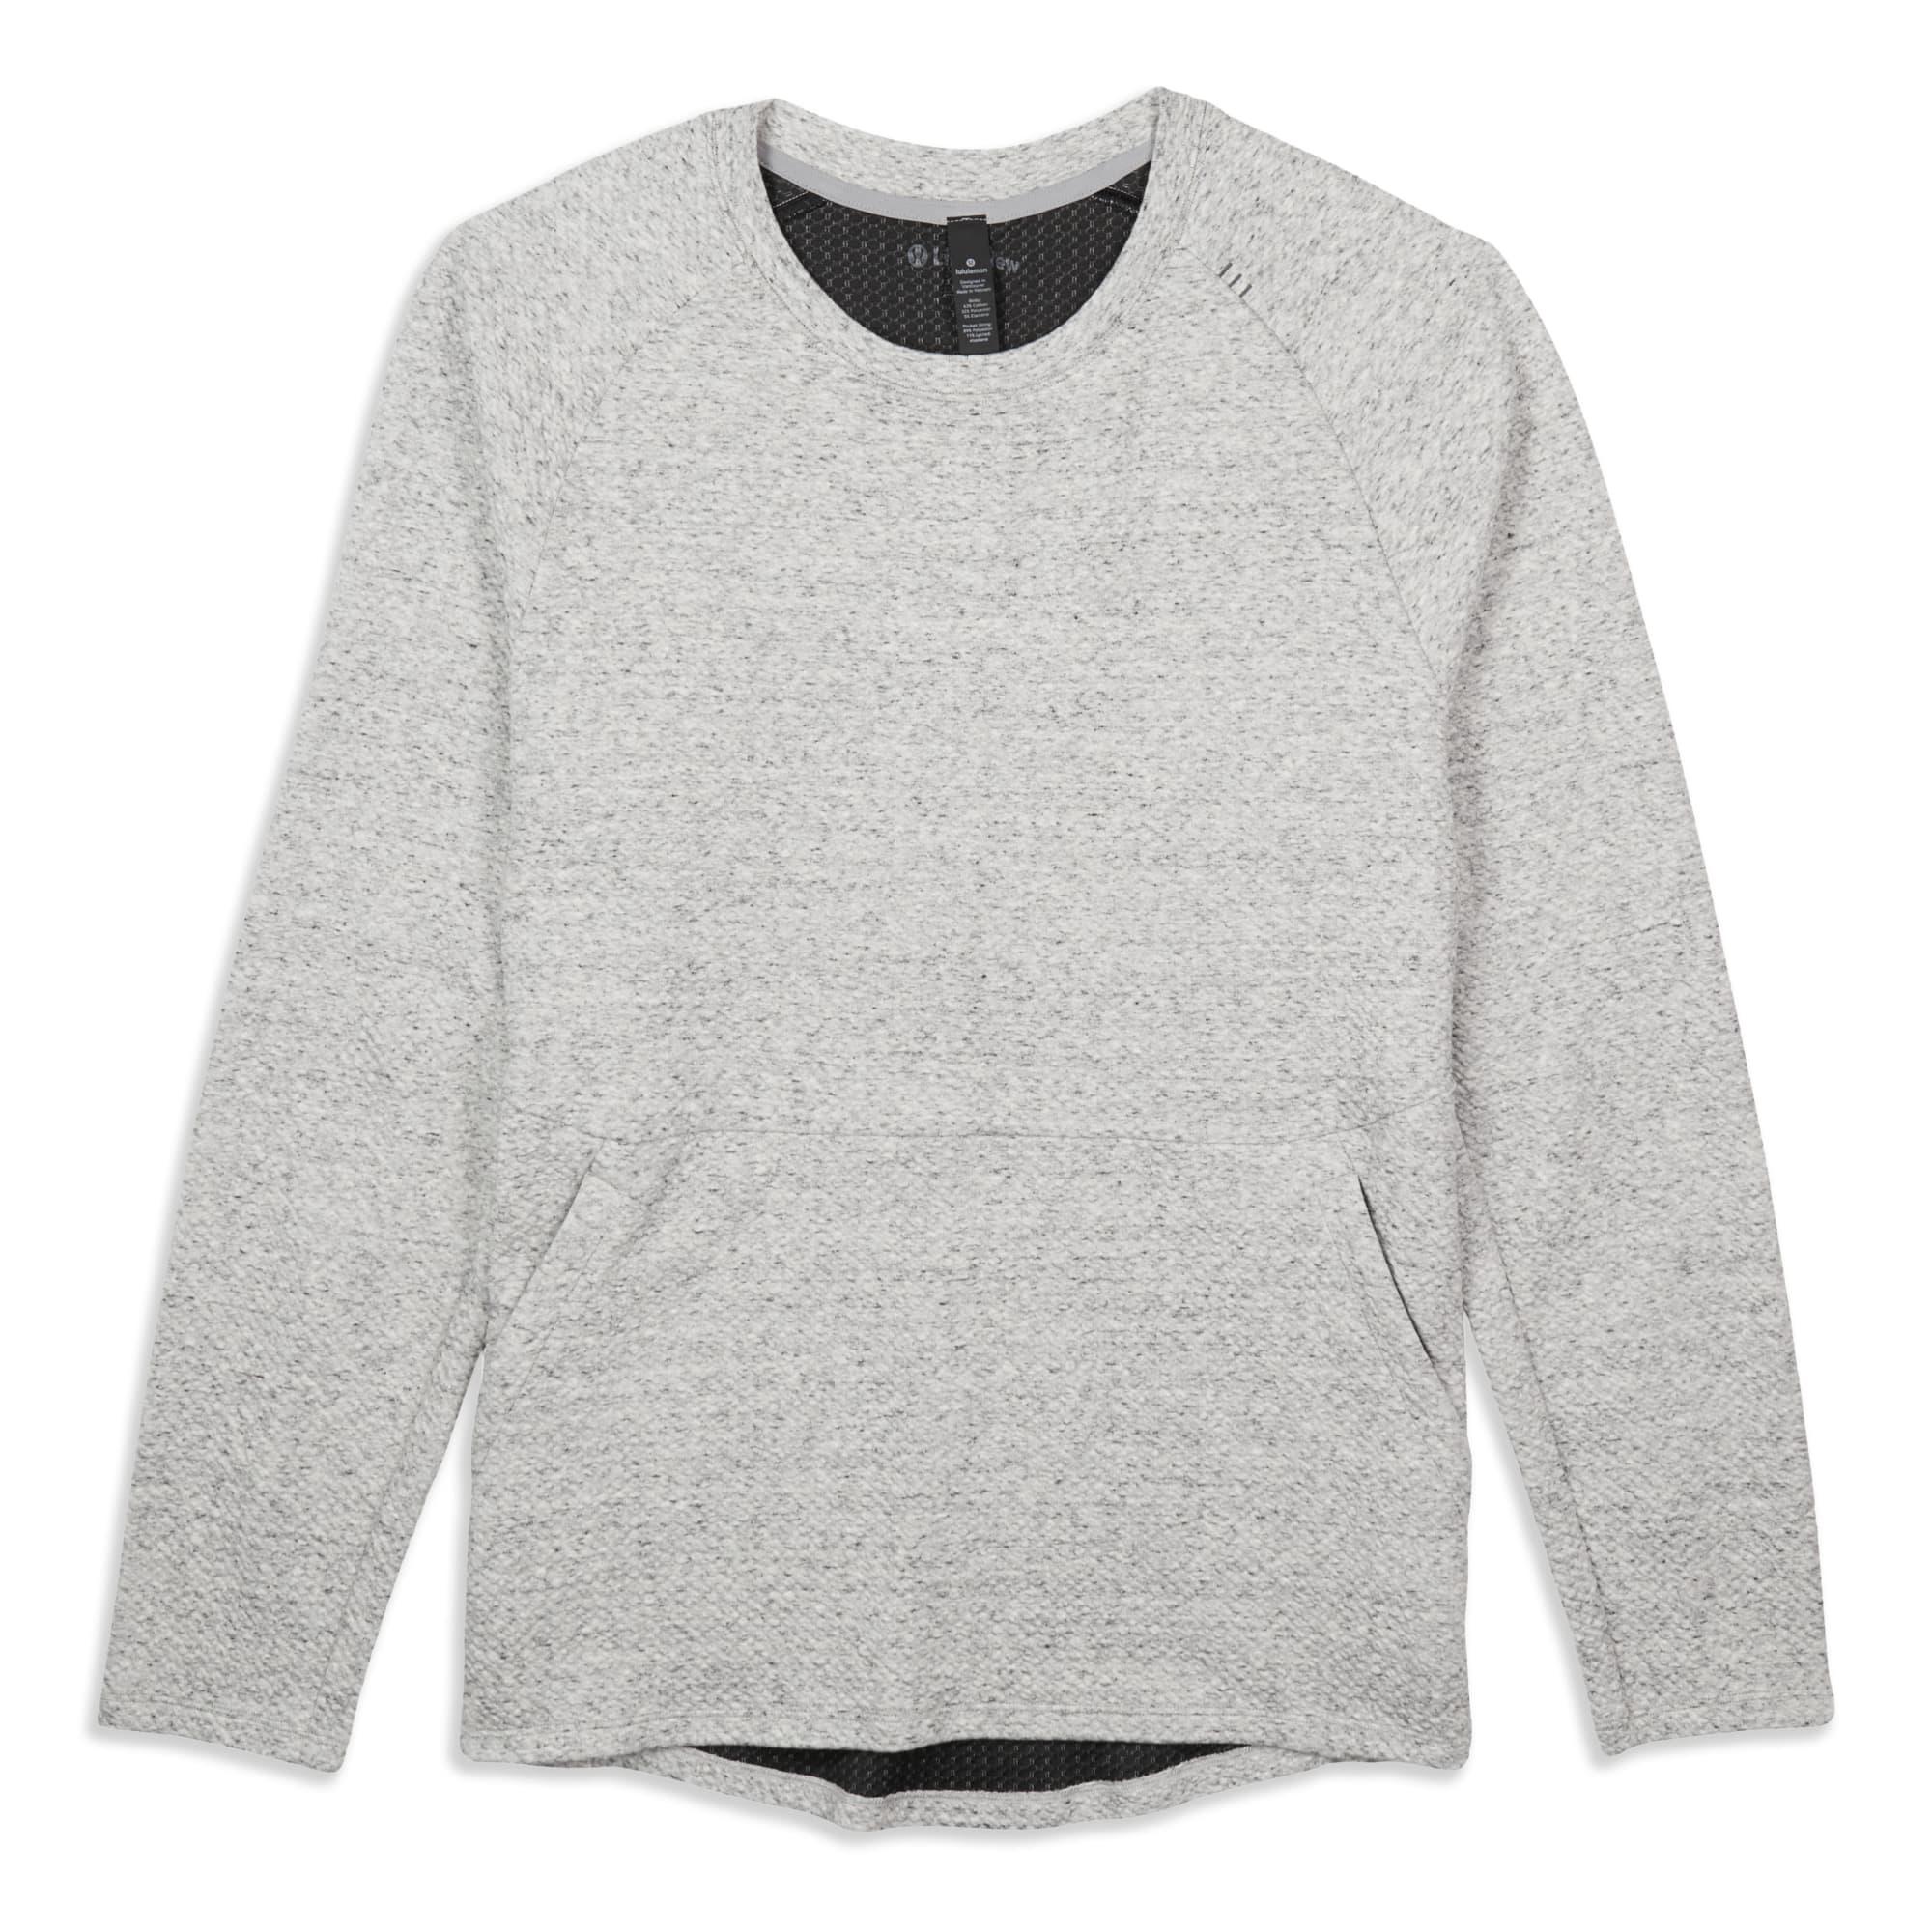 Main product image: At Ease Crewneck Sweatshirt - Resale